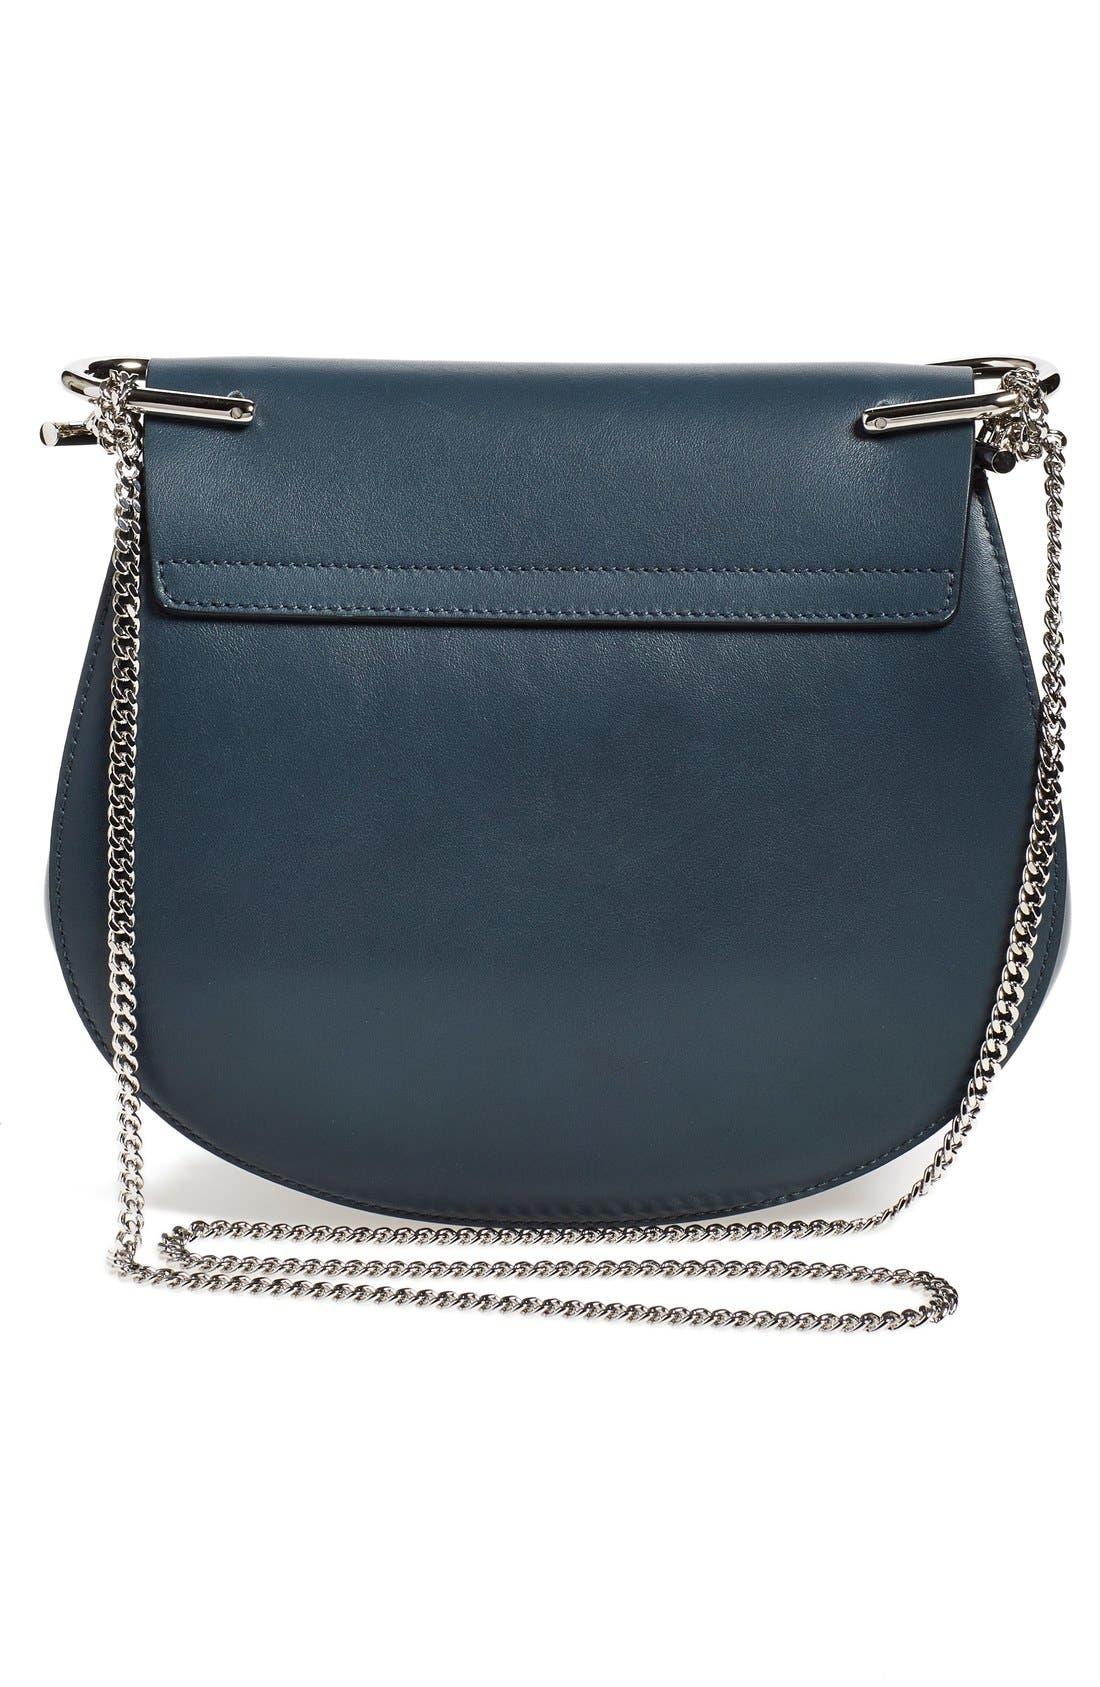 Alternate Image 2  - Chloé Small Drew Leather & Suede Shoulder Bag